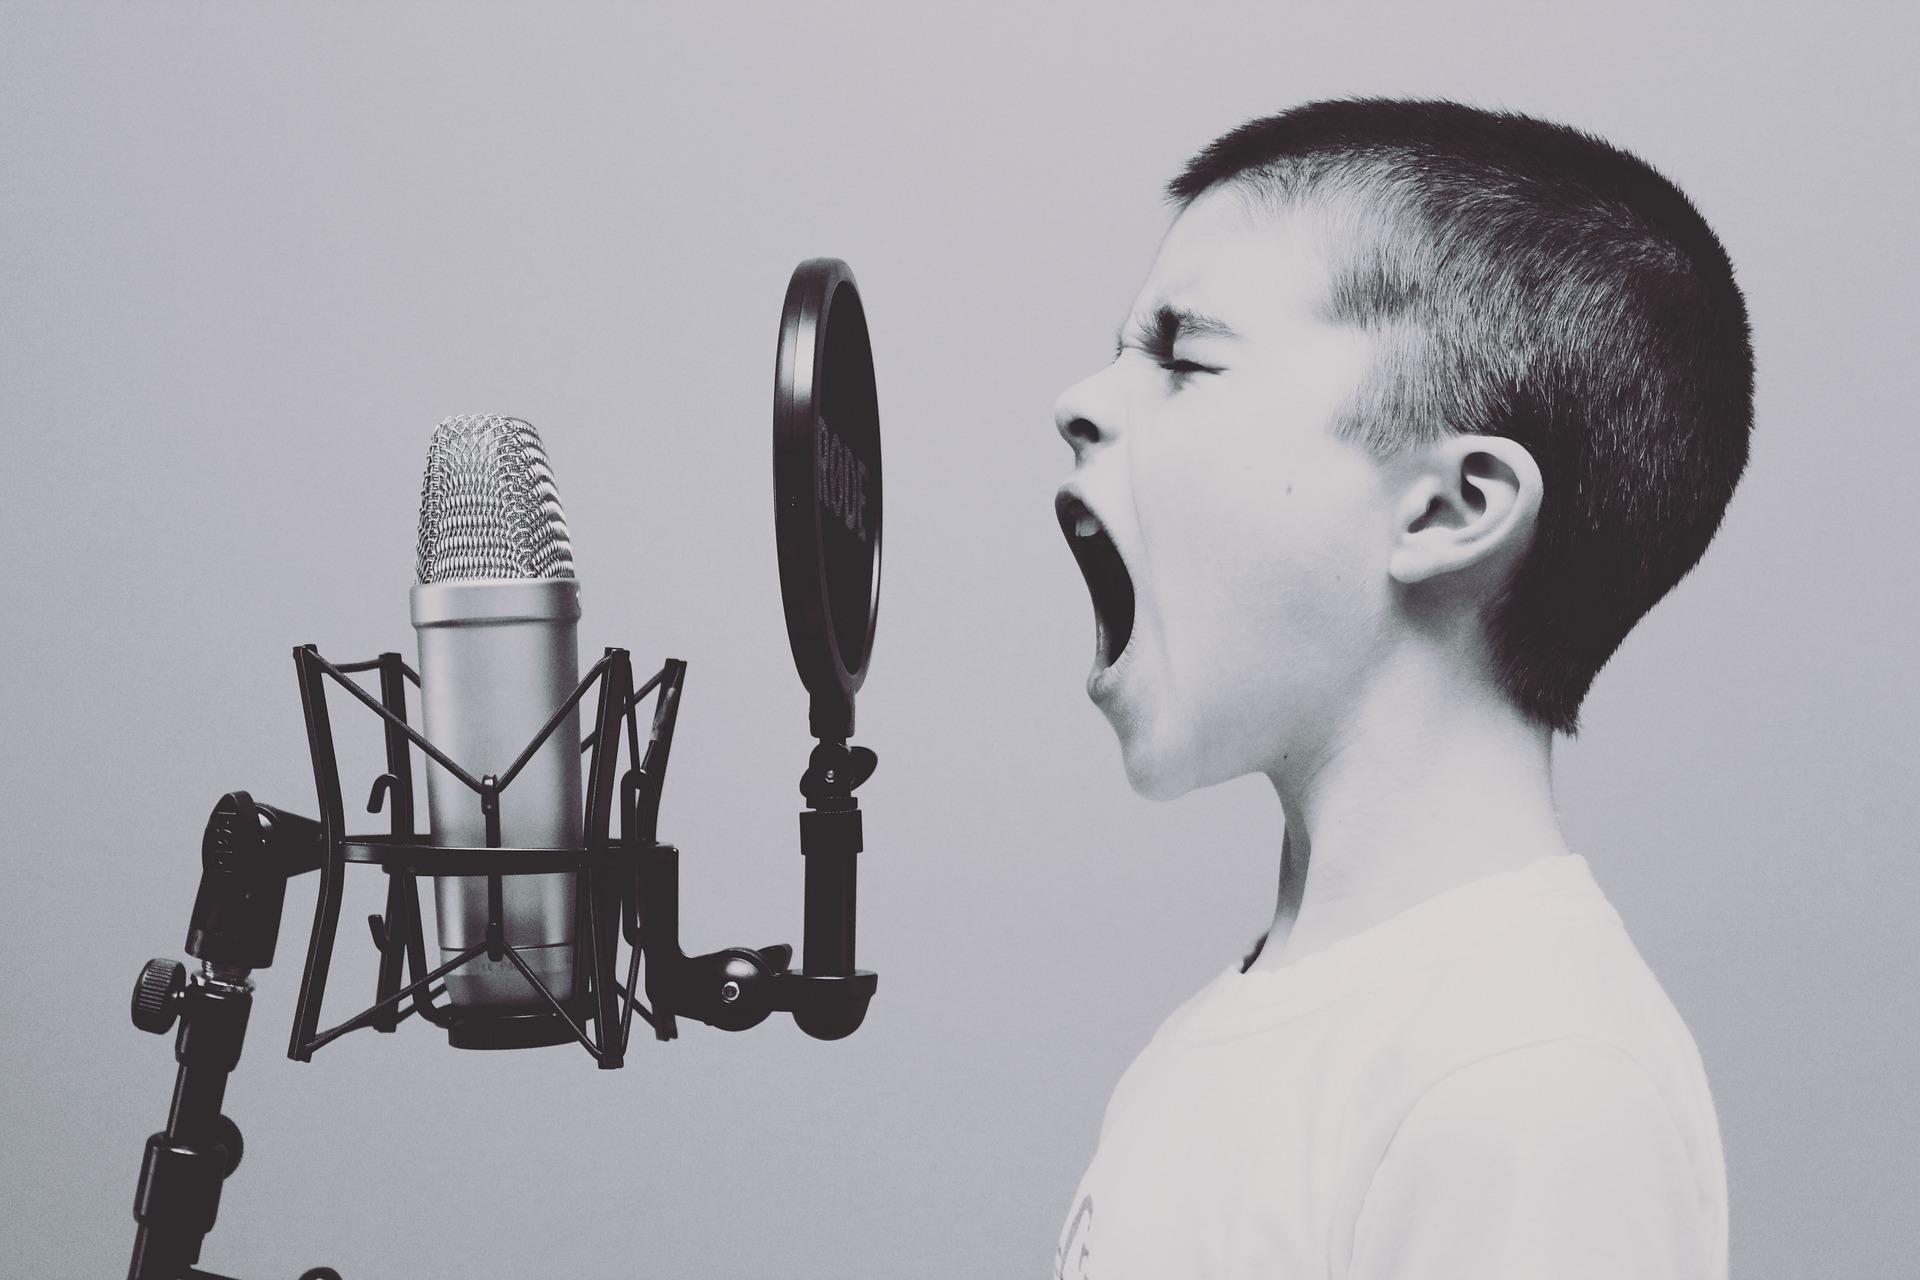 microphone-1209816_1920-1